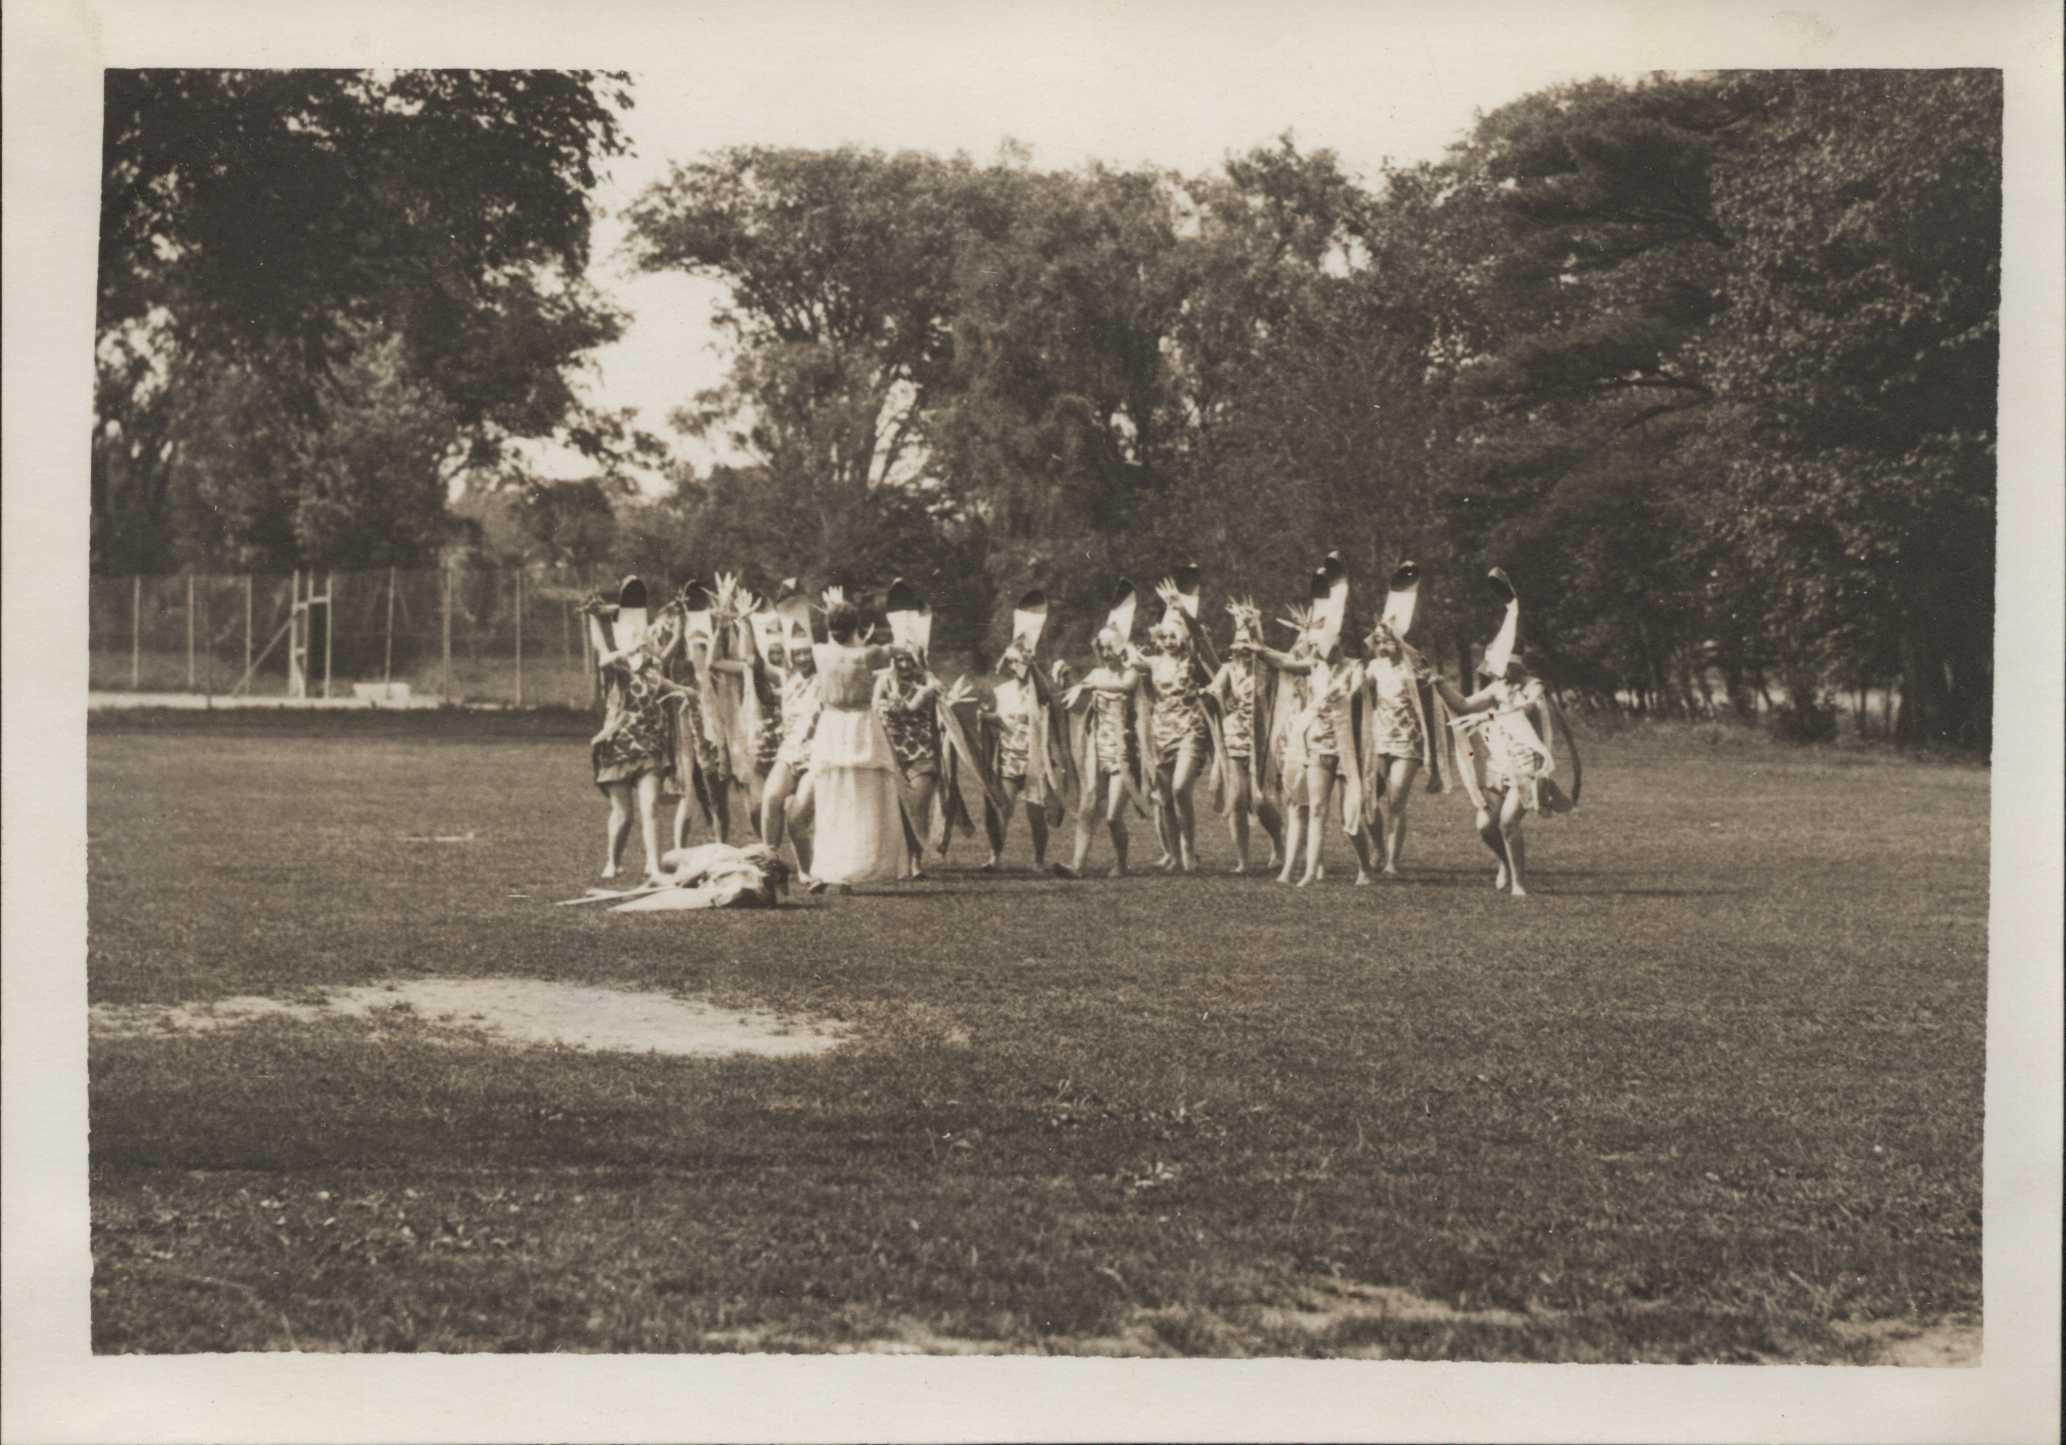 Celebrating May Day 1931